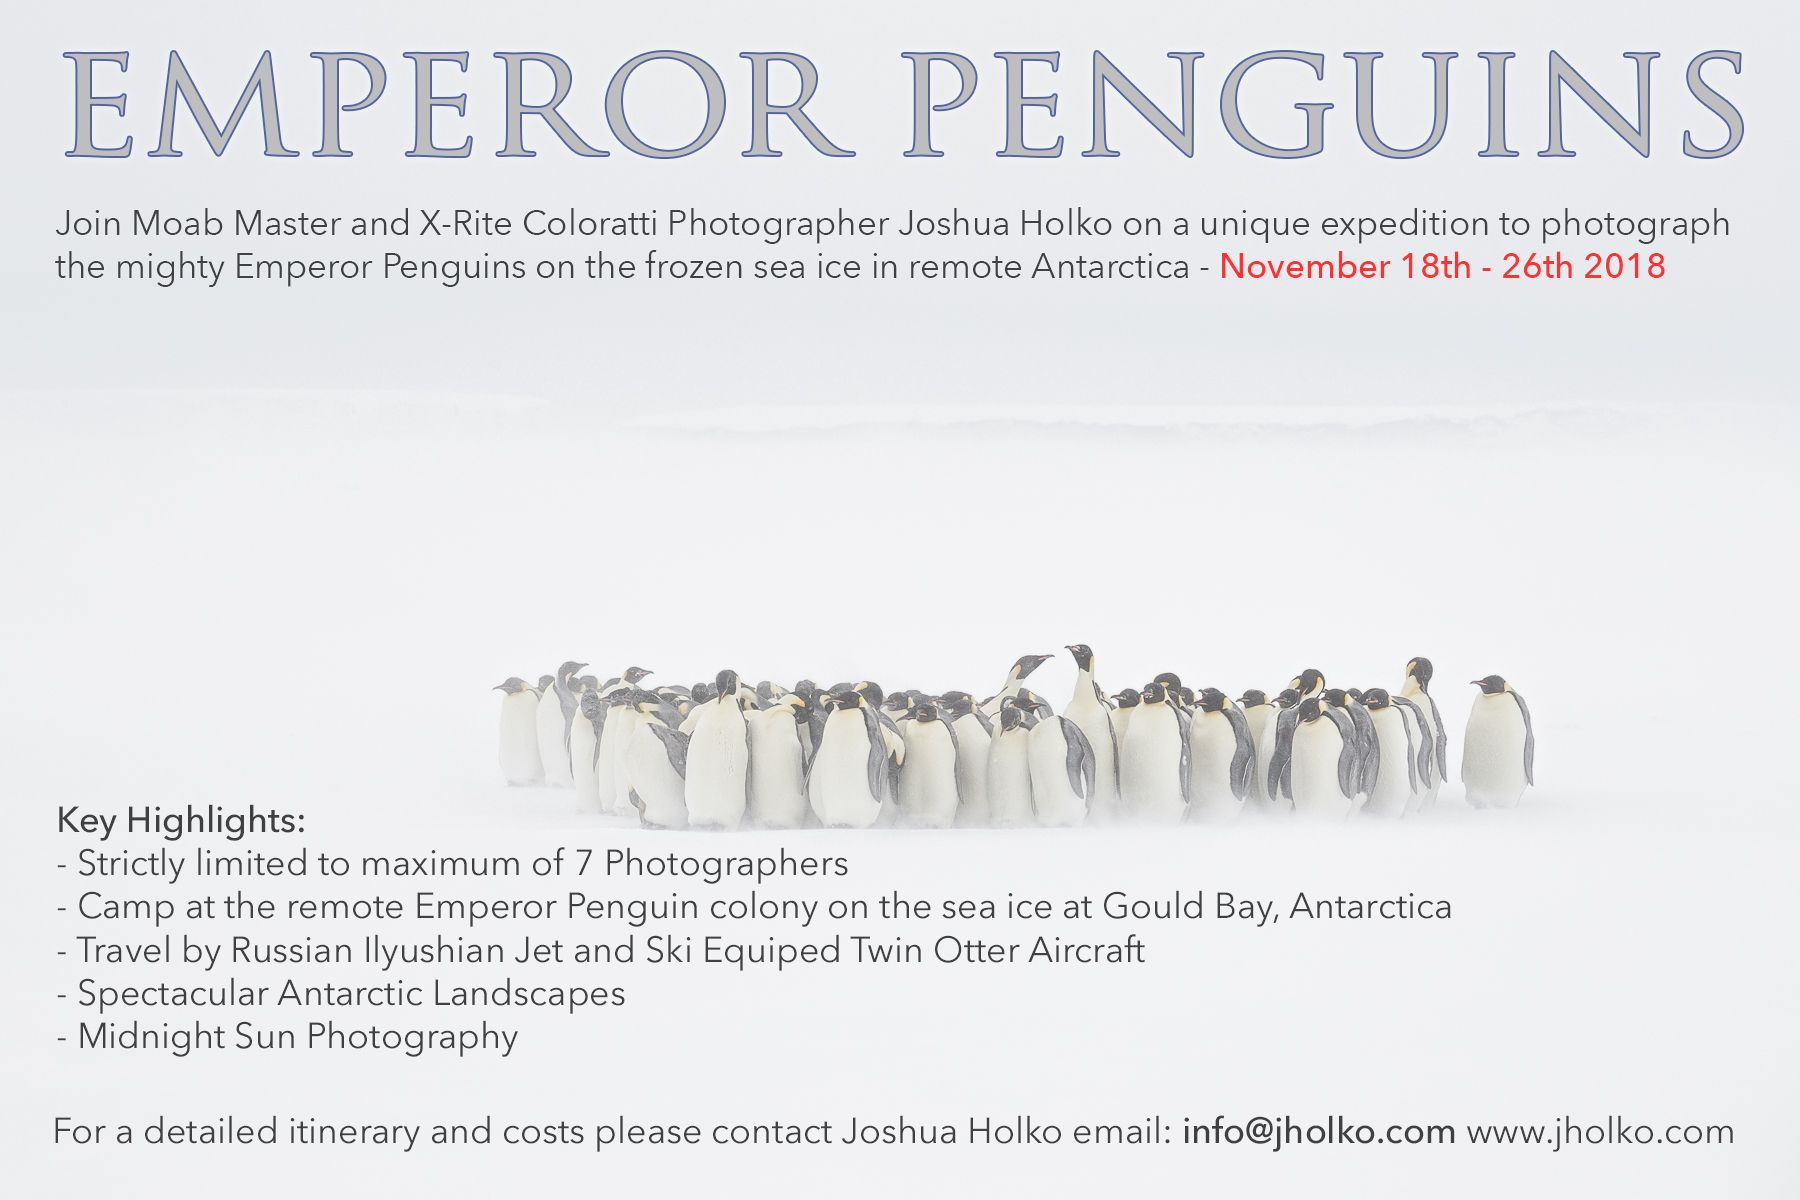 emperorpenguins-holko2018.jpg